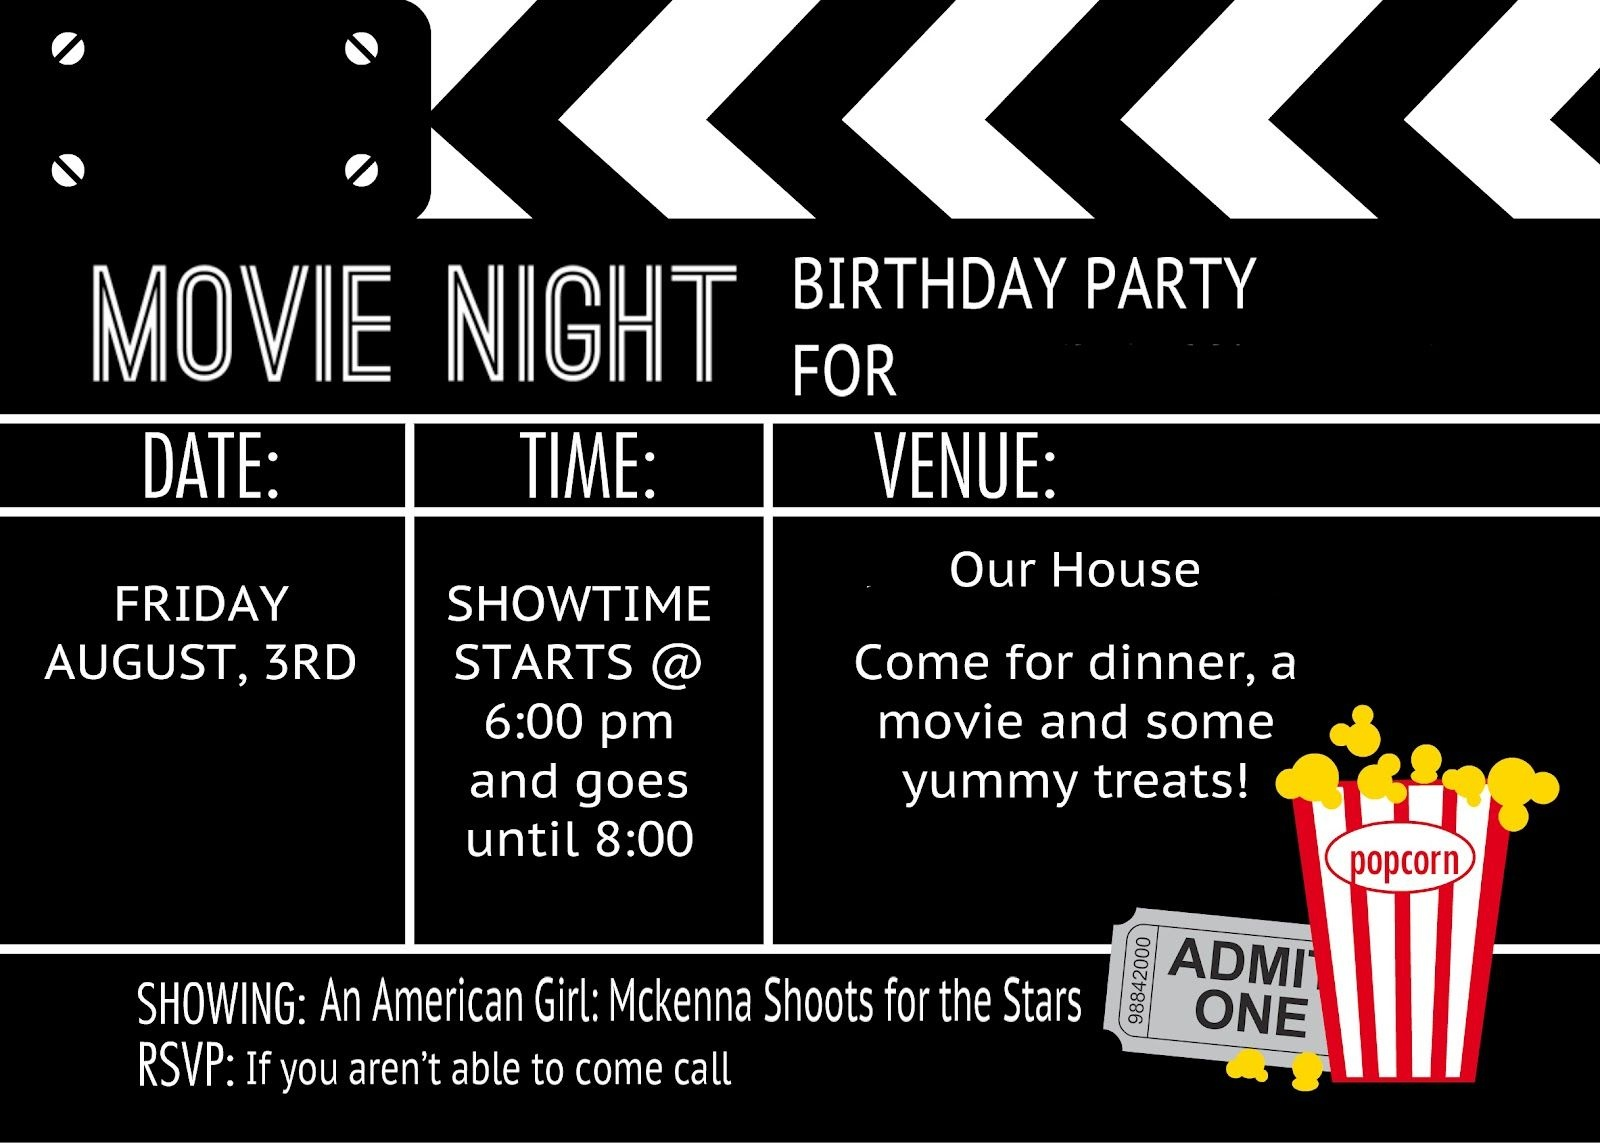 Birthday Party Invitation Templates Movie Theme   Kalli's 13Th - Movie Night Birthday Invitations Free Printable